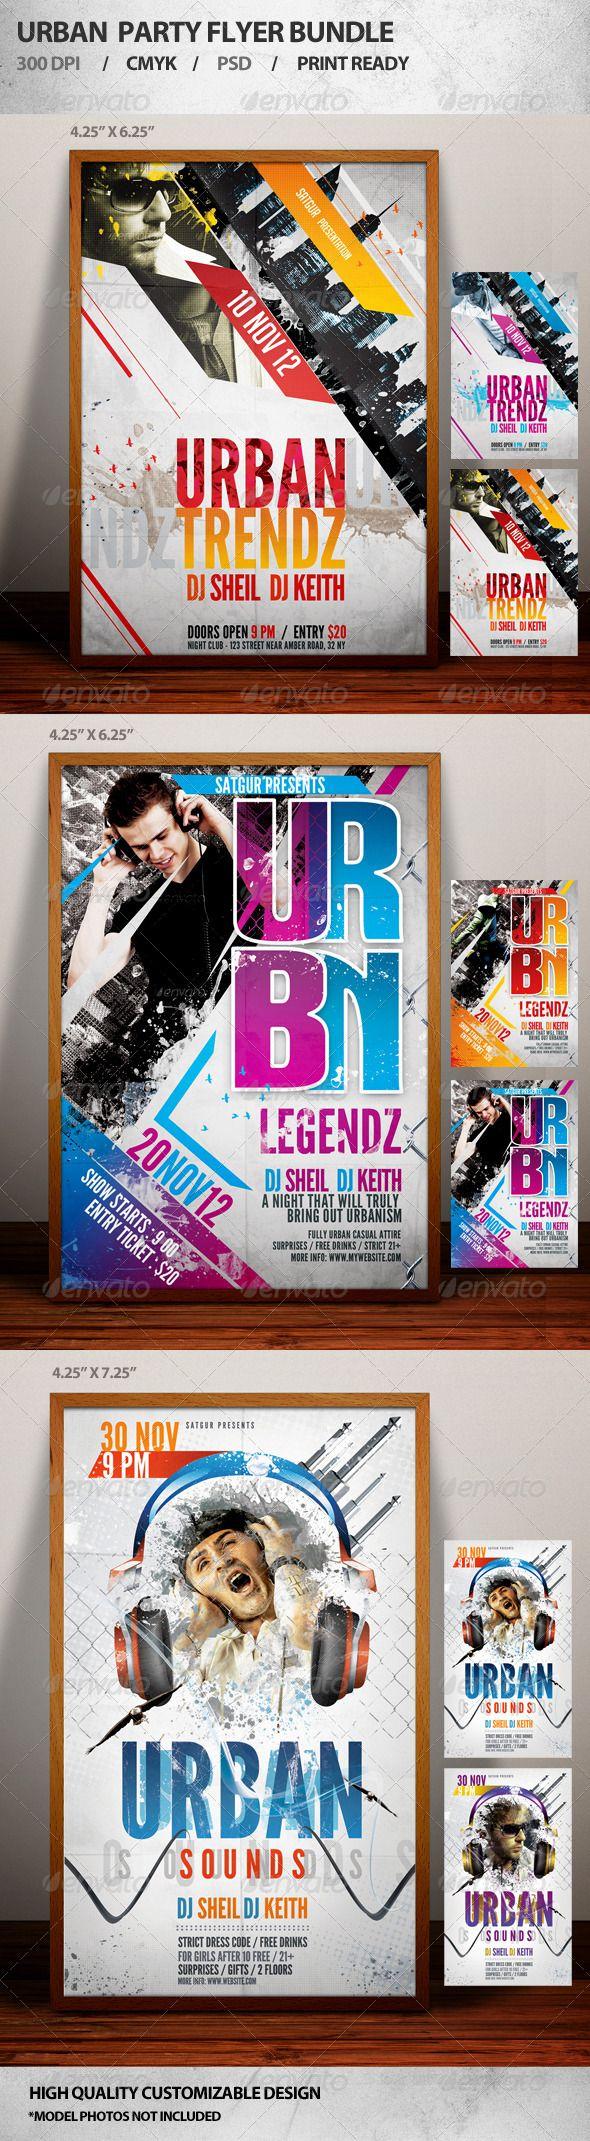 Poster design dimensions - Urban Party Flyer Bundle